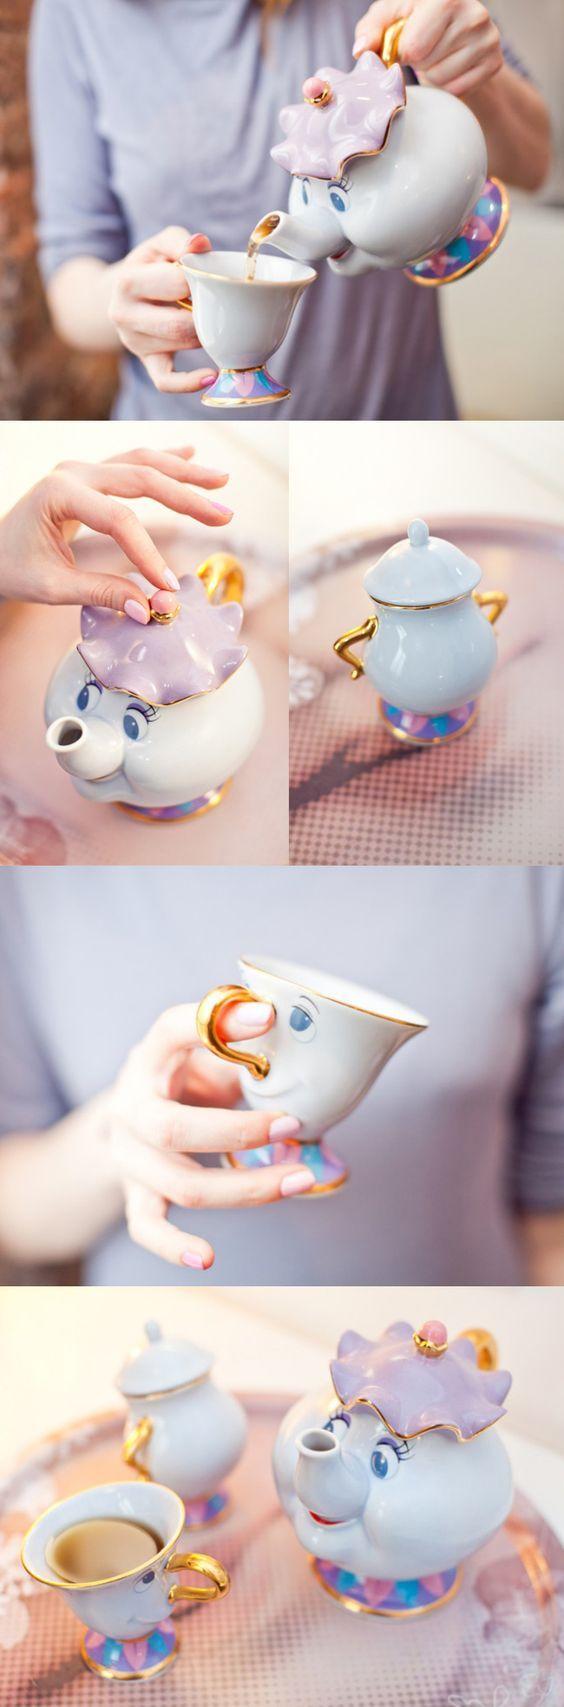 NEED this one day!! Beauty & The Beast, Mrs. Potts Disney Teapot Set